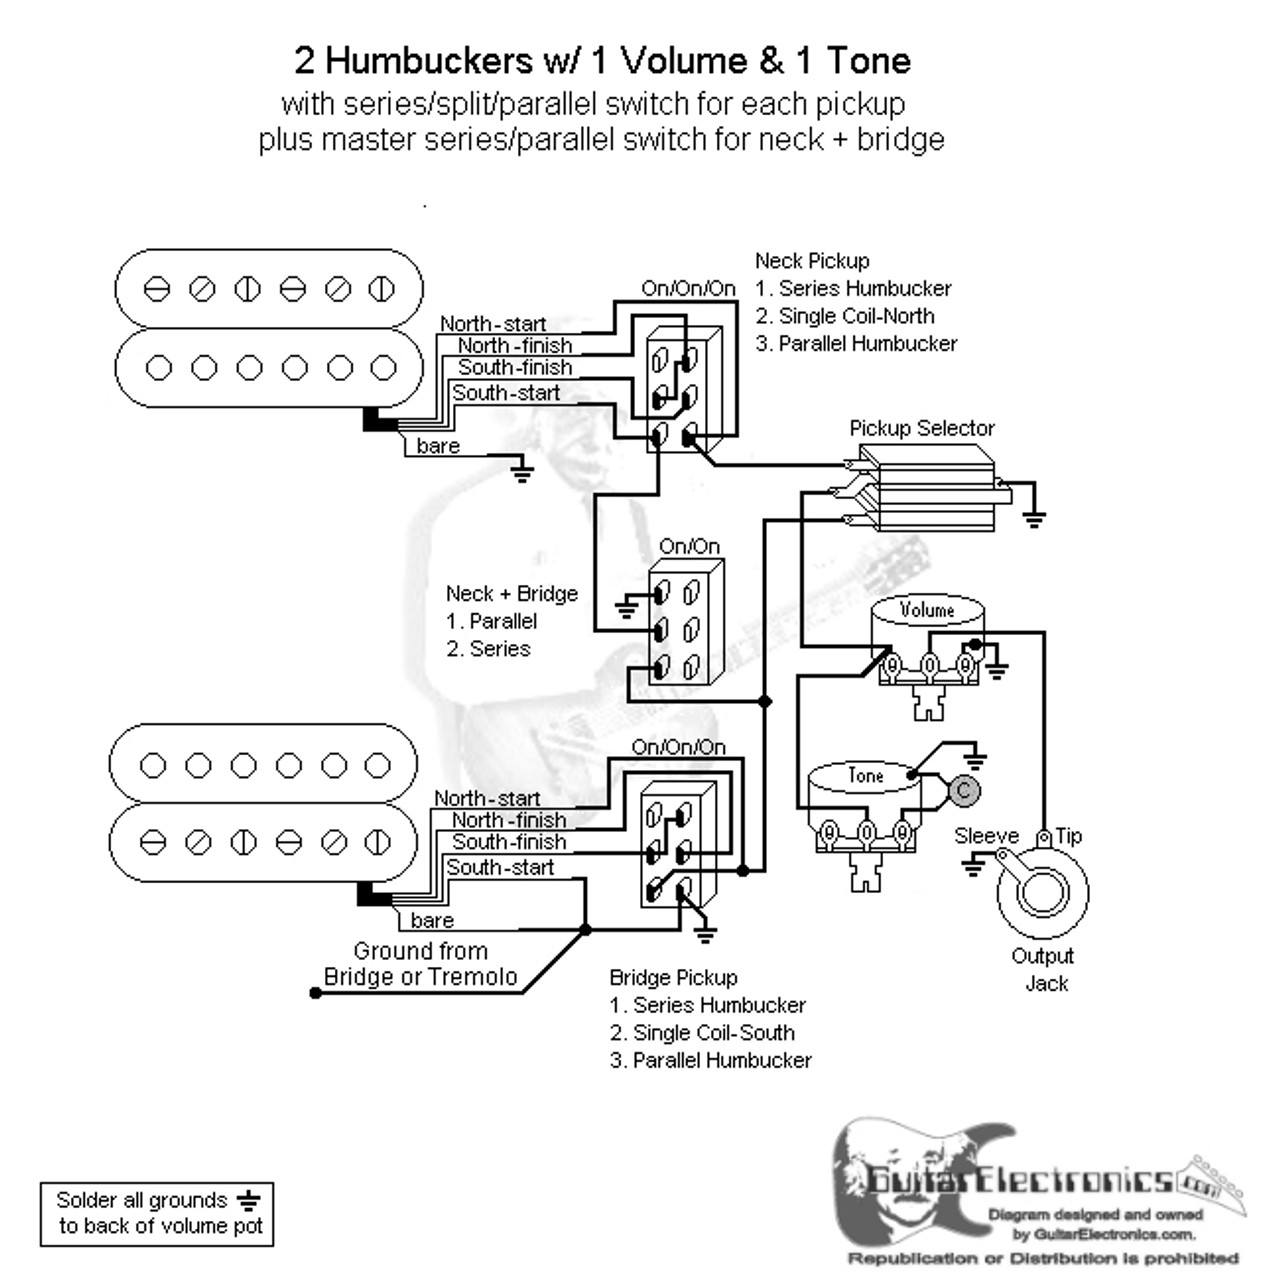 2 hbs 3 way toggle 1 vol 1 tone series split parallel \u0026 masterHumbuckers 3way Toggle Switch 1 Volume 1 Tone Seriessplitparallel #1